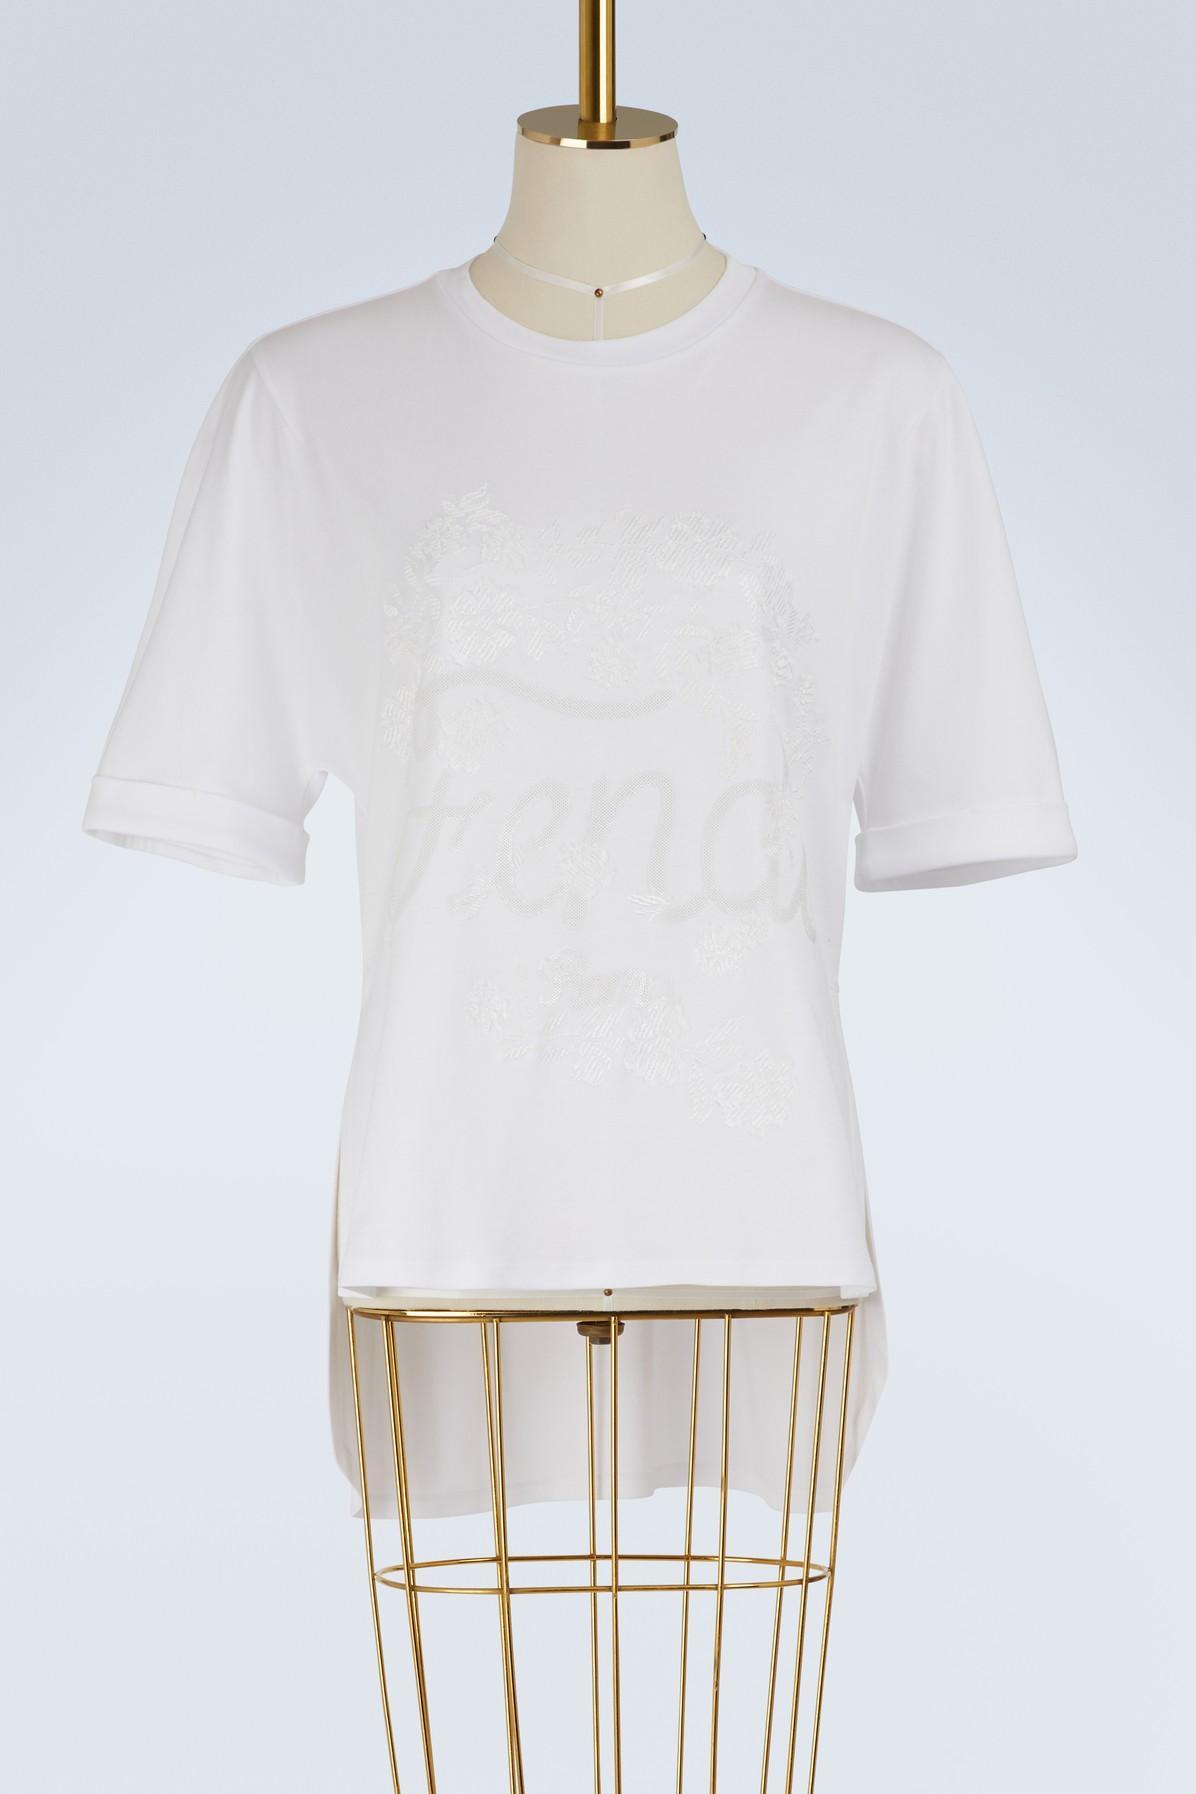 Fendi T-shirt In F0znm